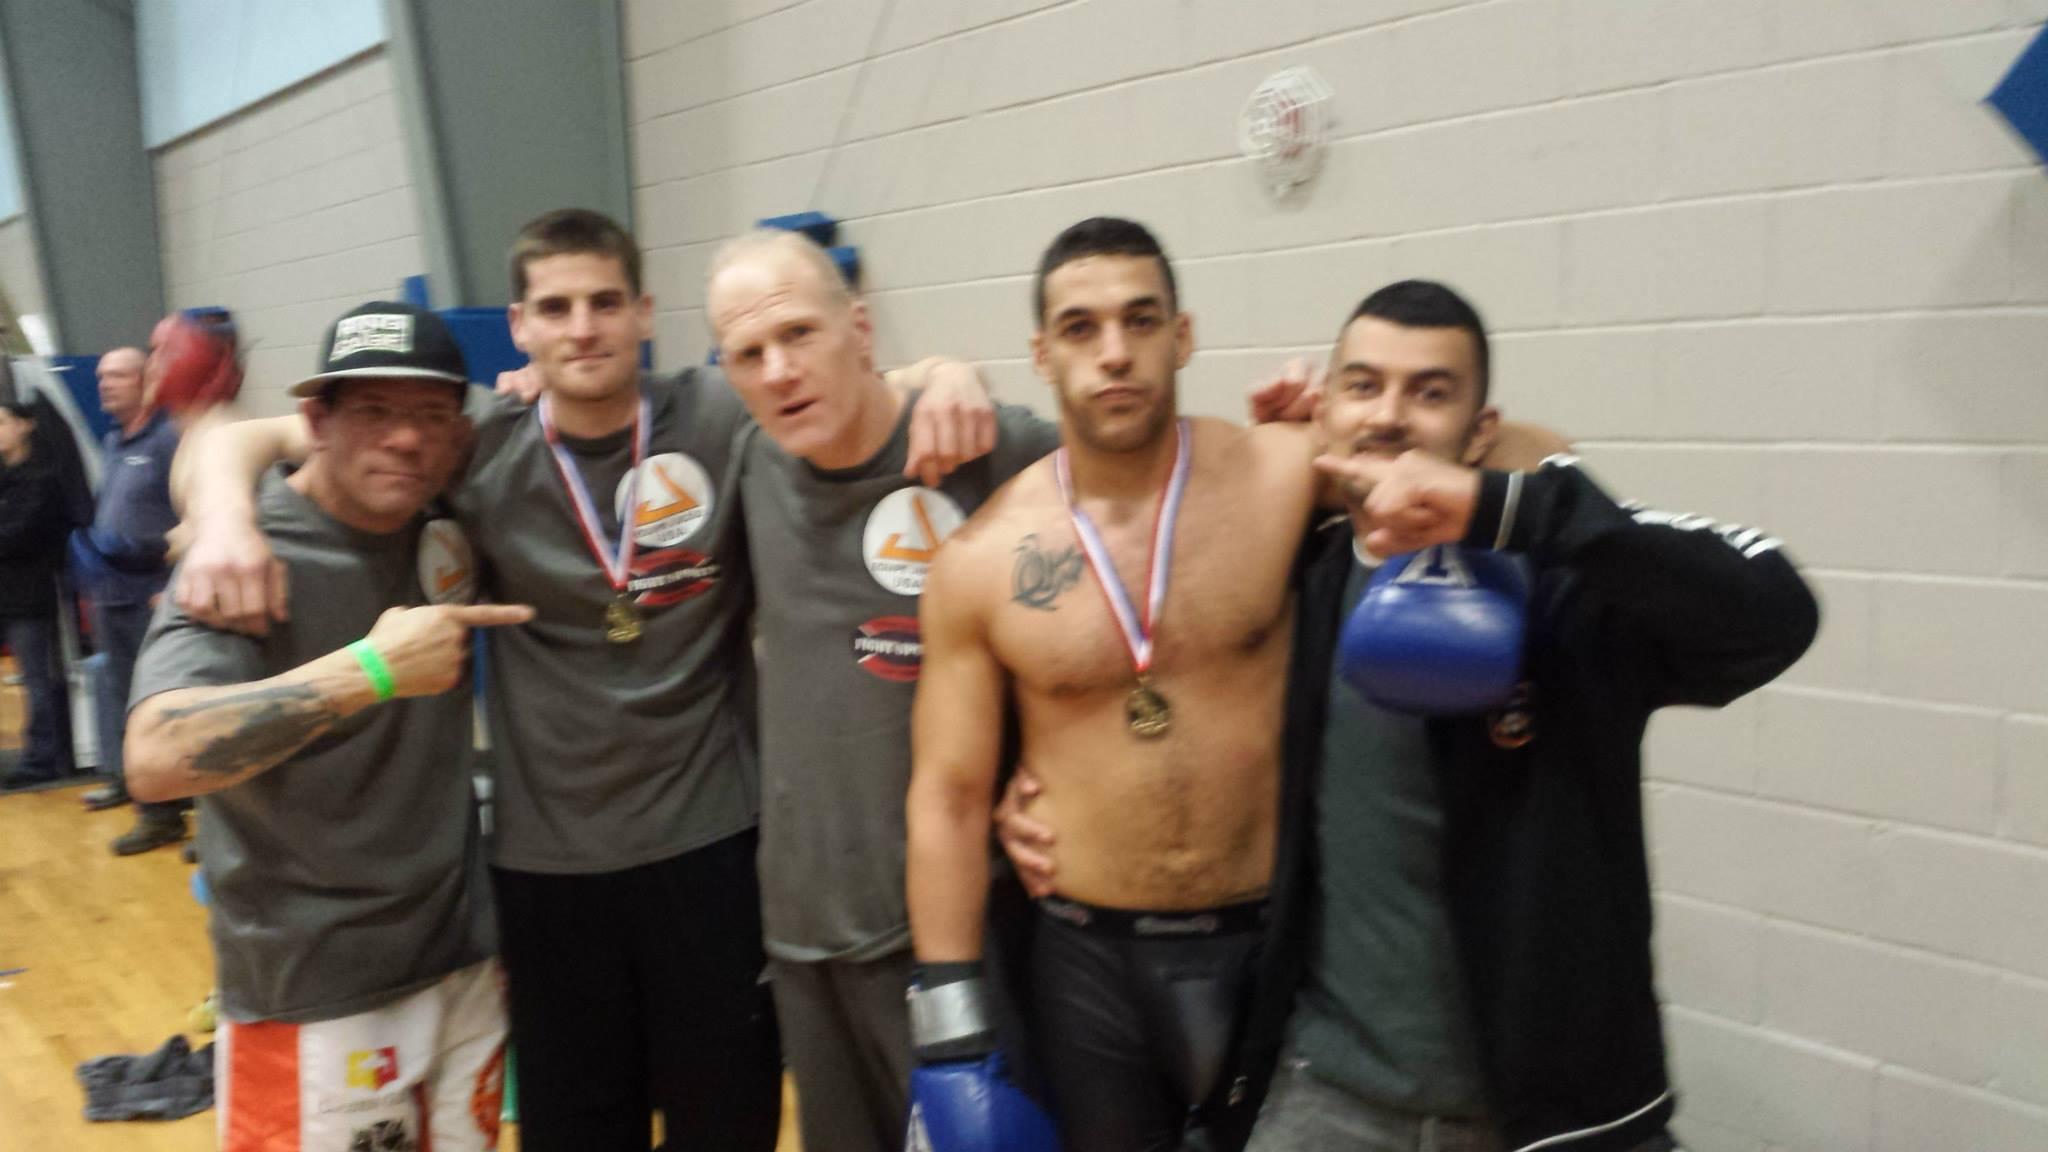 Muay Thai NJ - Fight and Fitness MMA Wins!